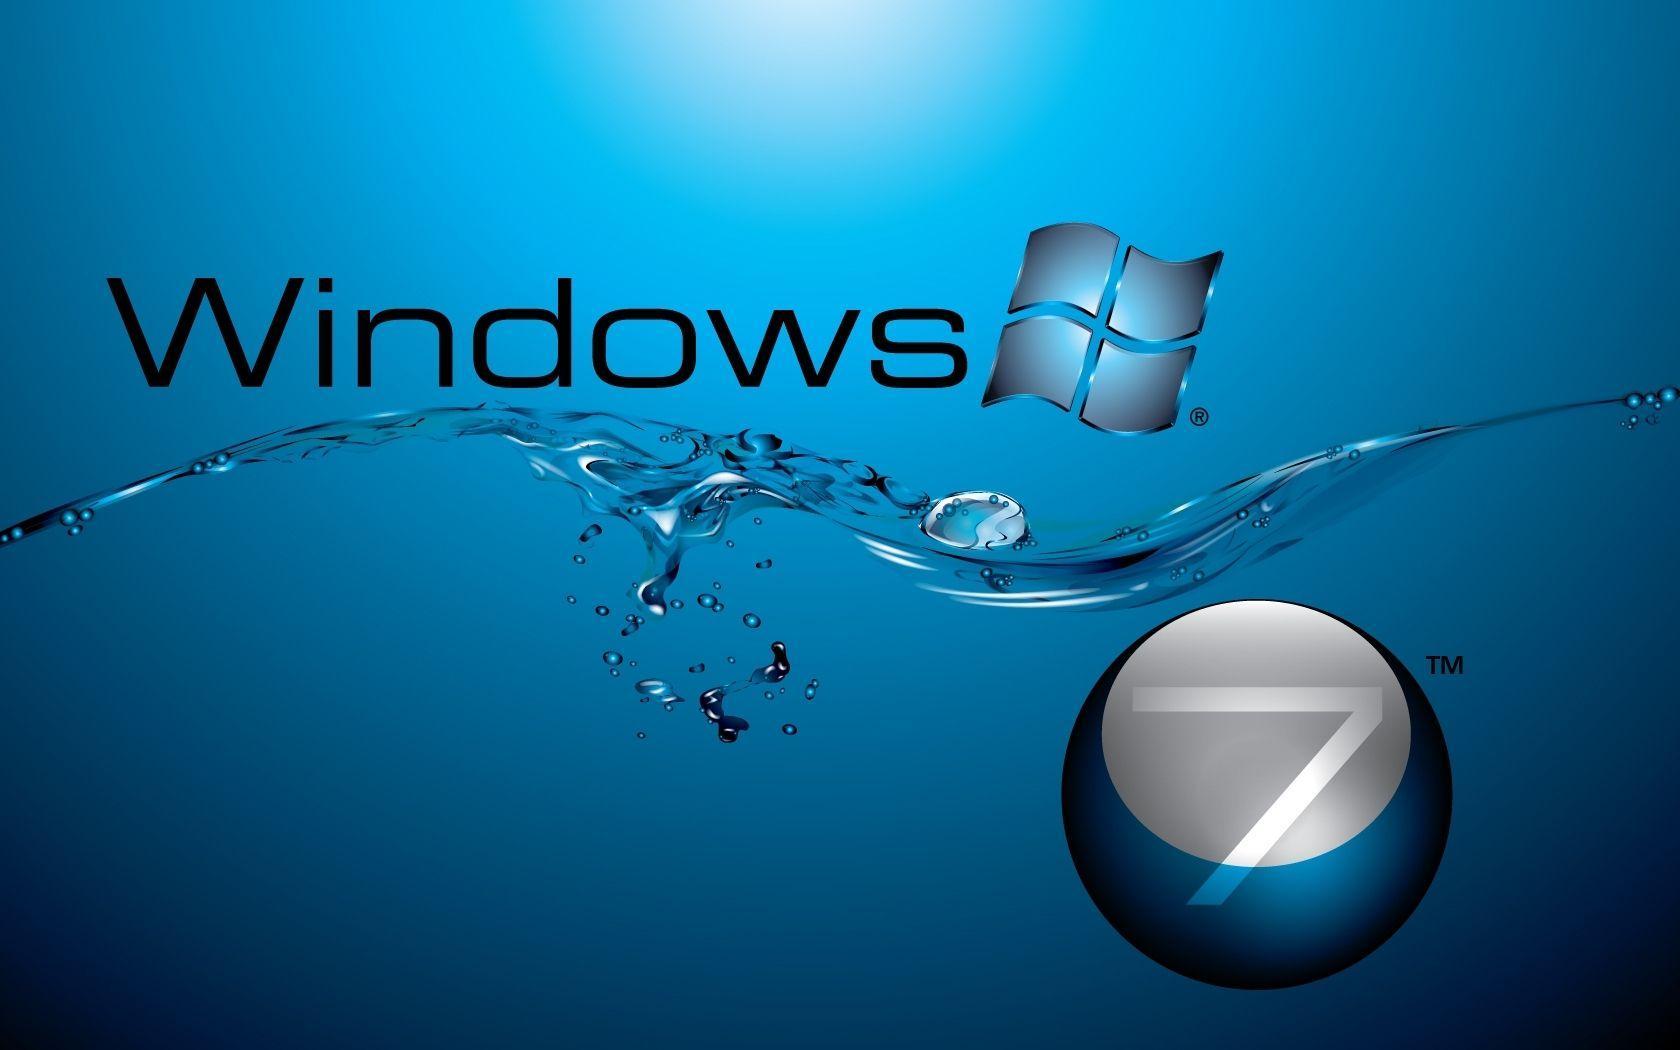 Windows 7 Hd Wallpapers Top Free Windows 7 Hd Backgrounds Wallpaperaccess